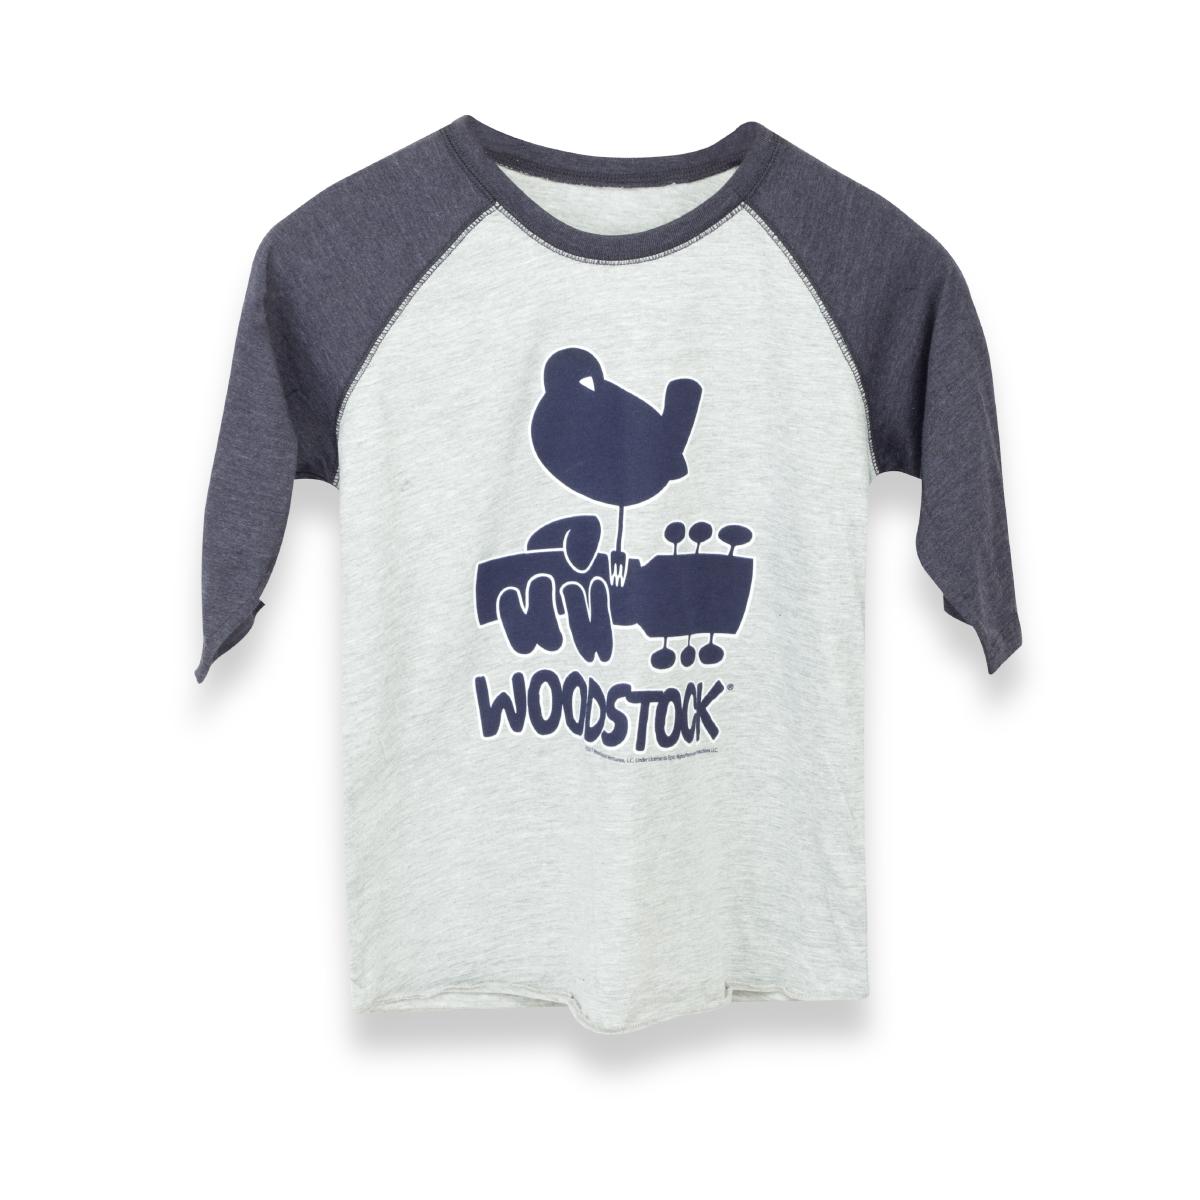 Woodstock Blue Youth Raglan